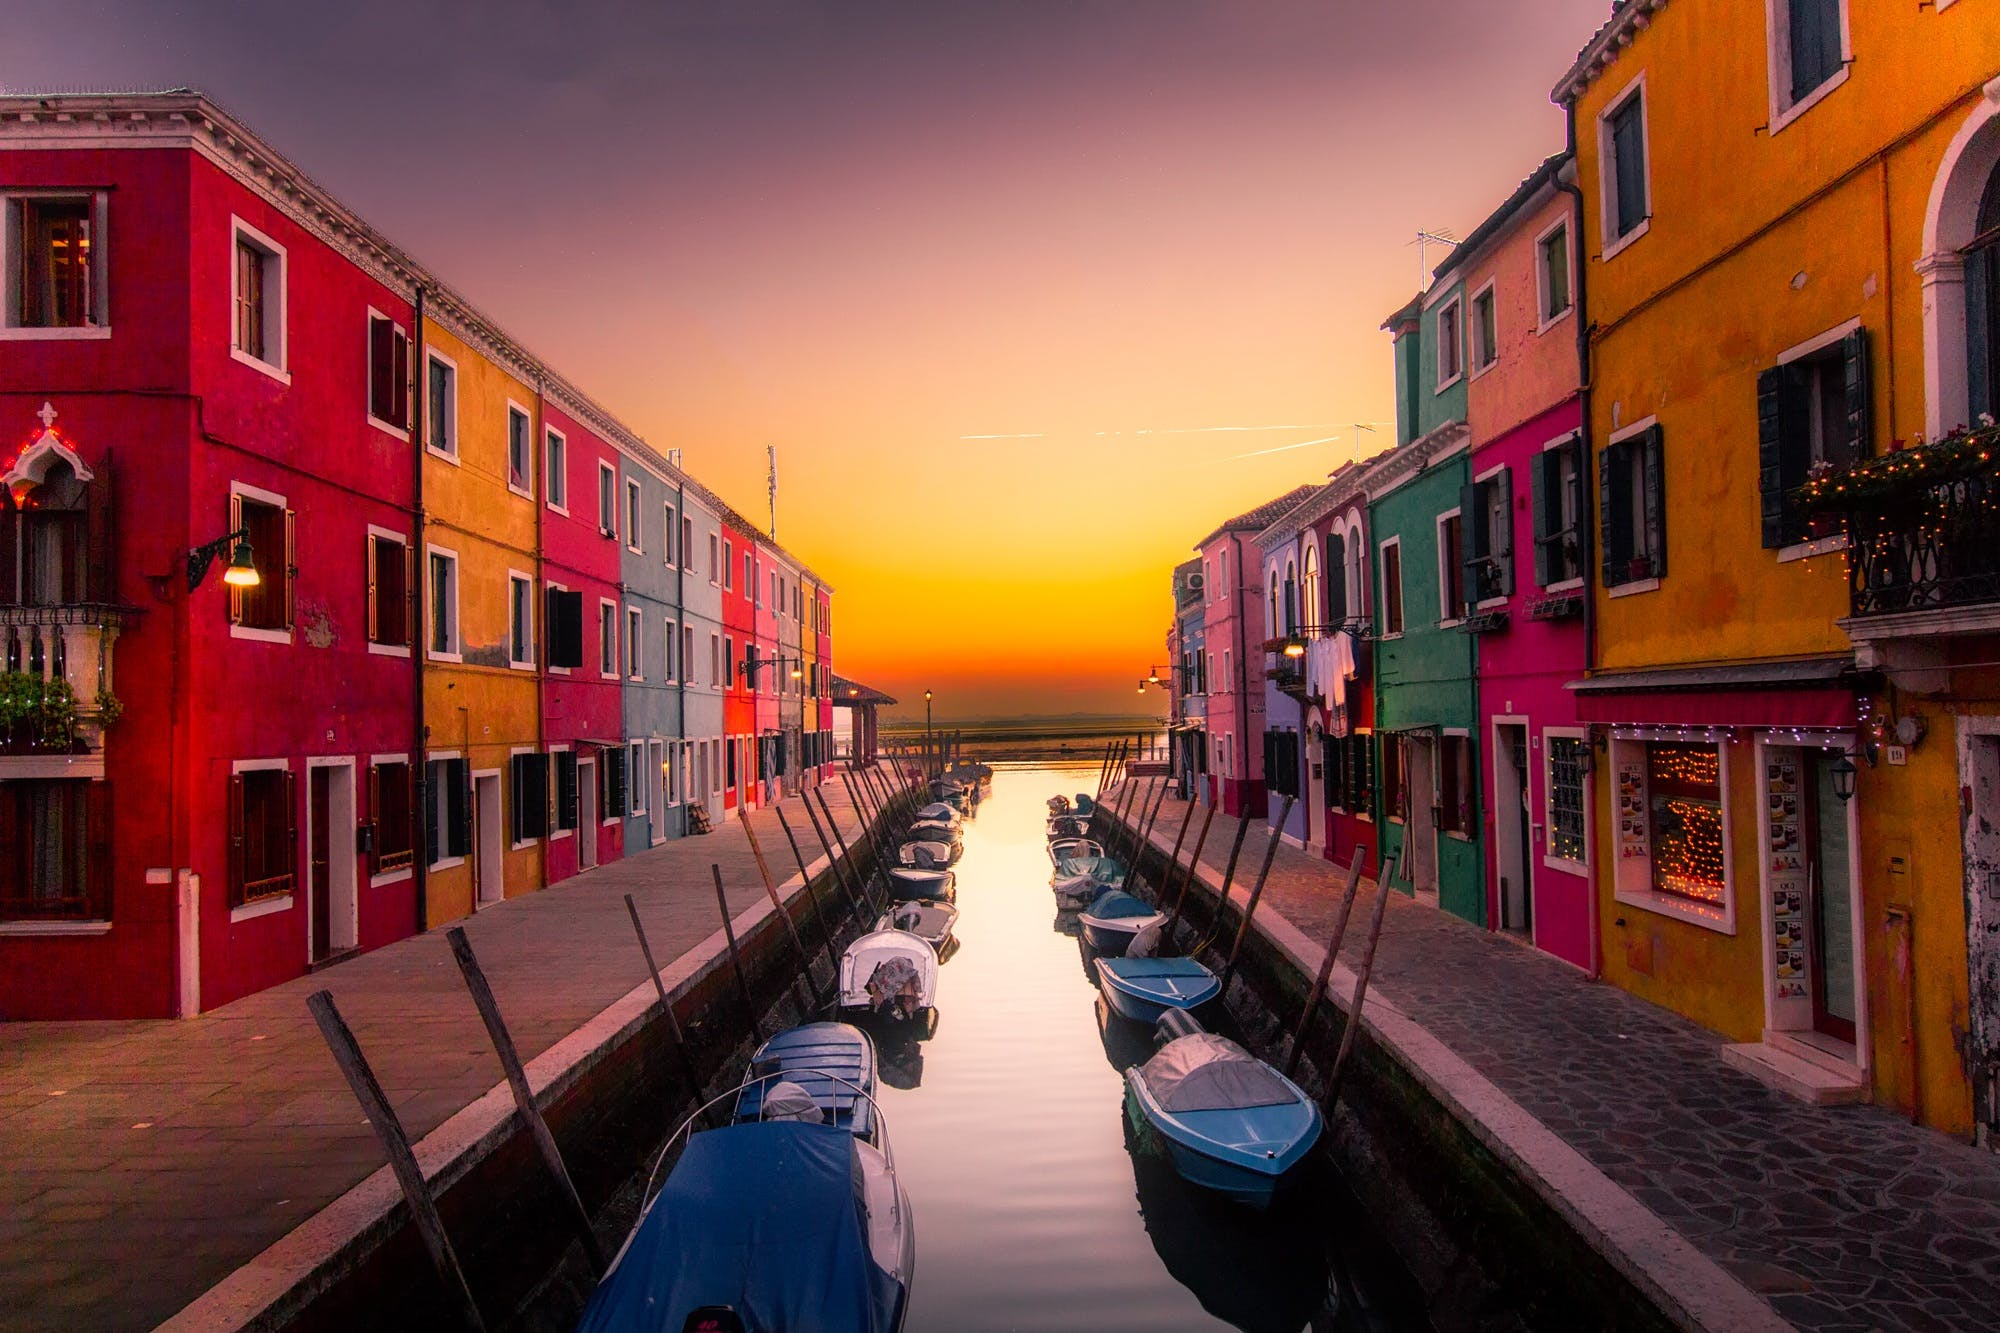 Kostenloses Stock Foto zu architektur, boote, europa, farben